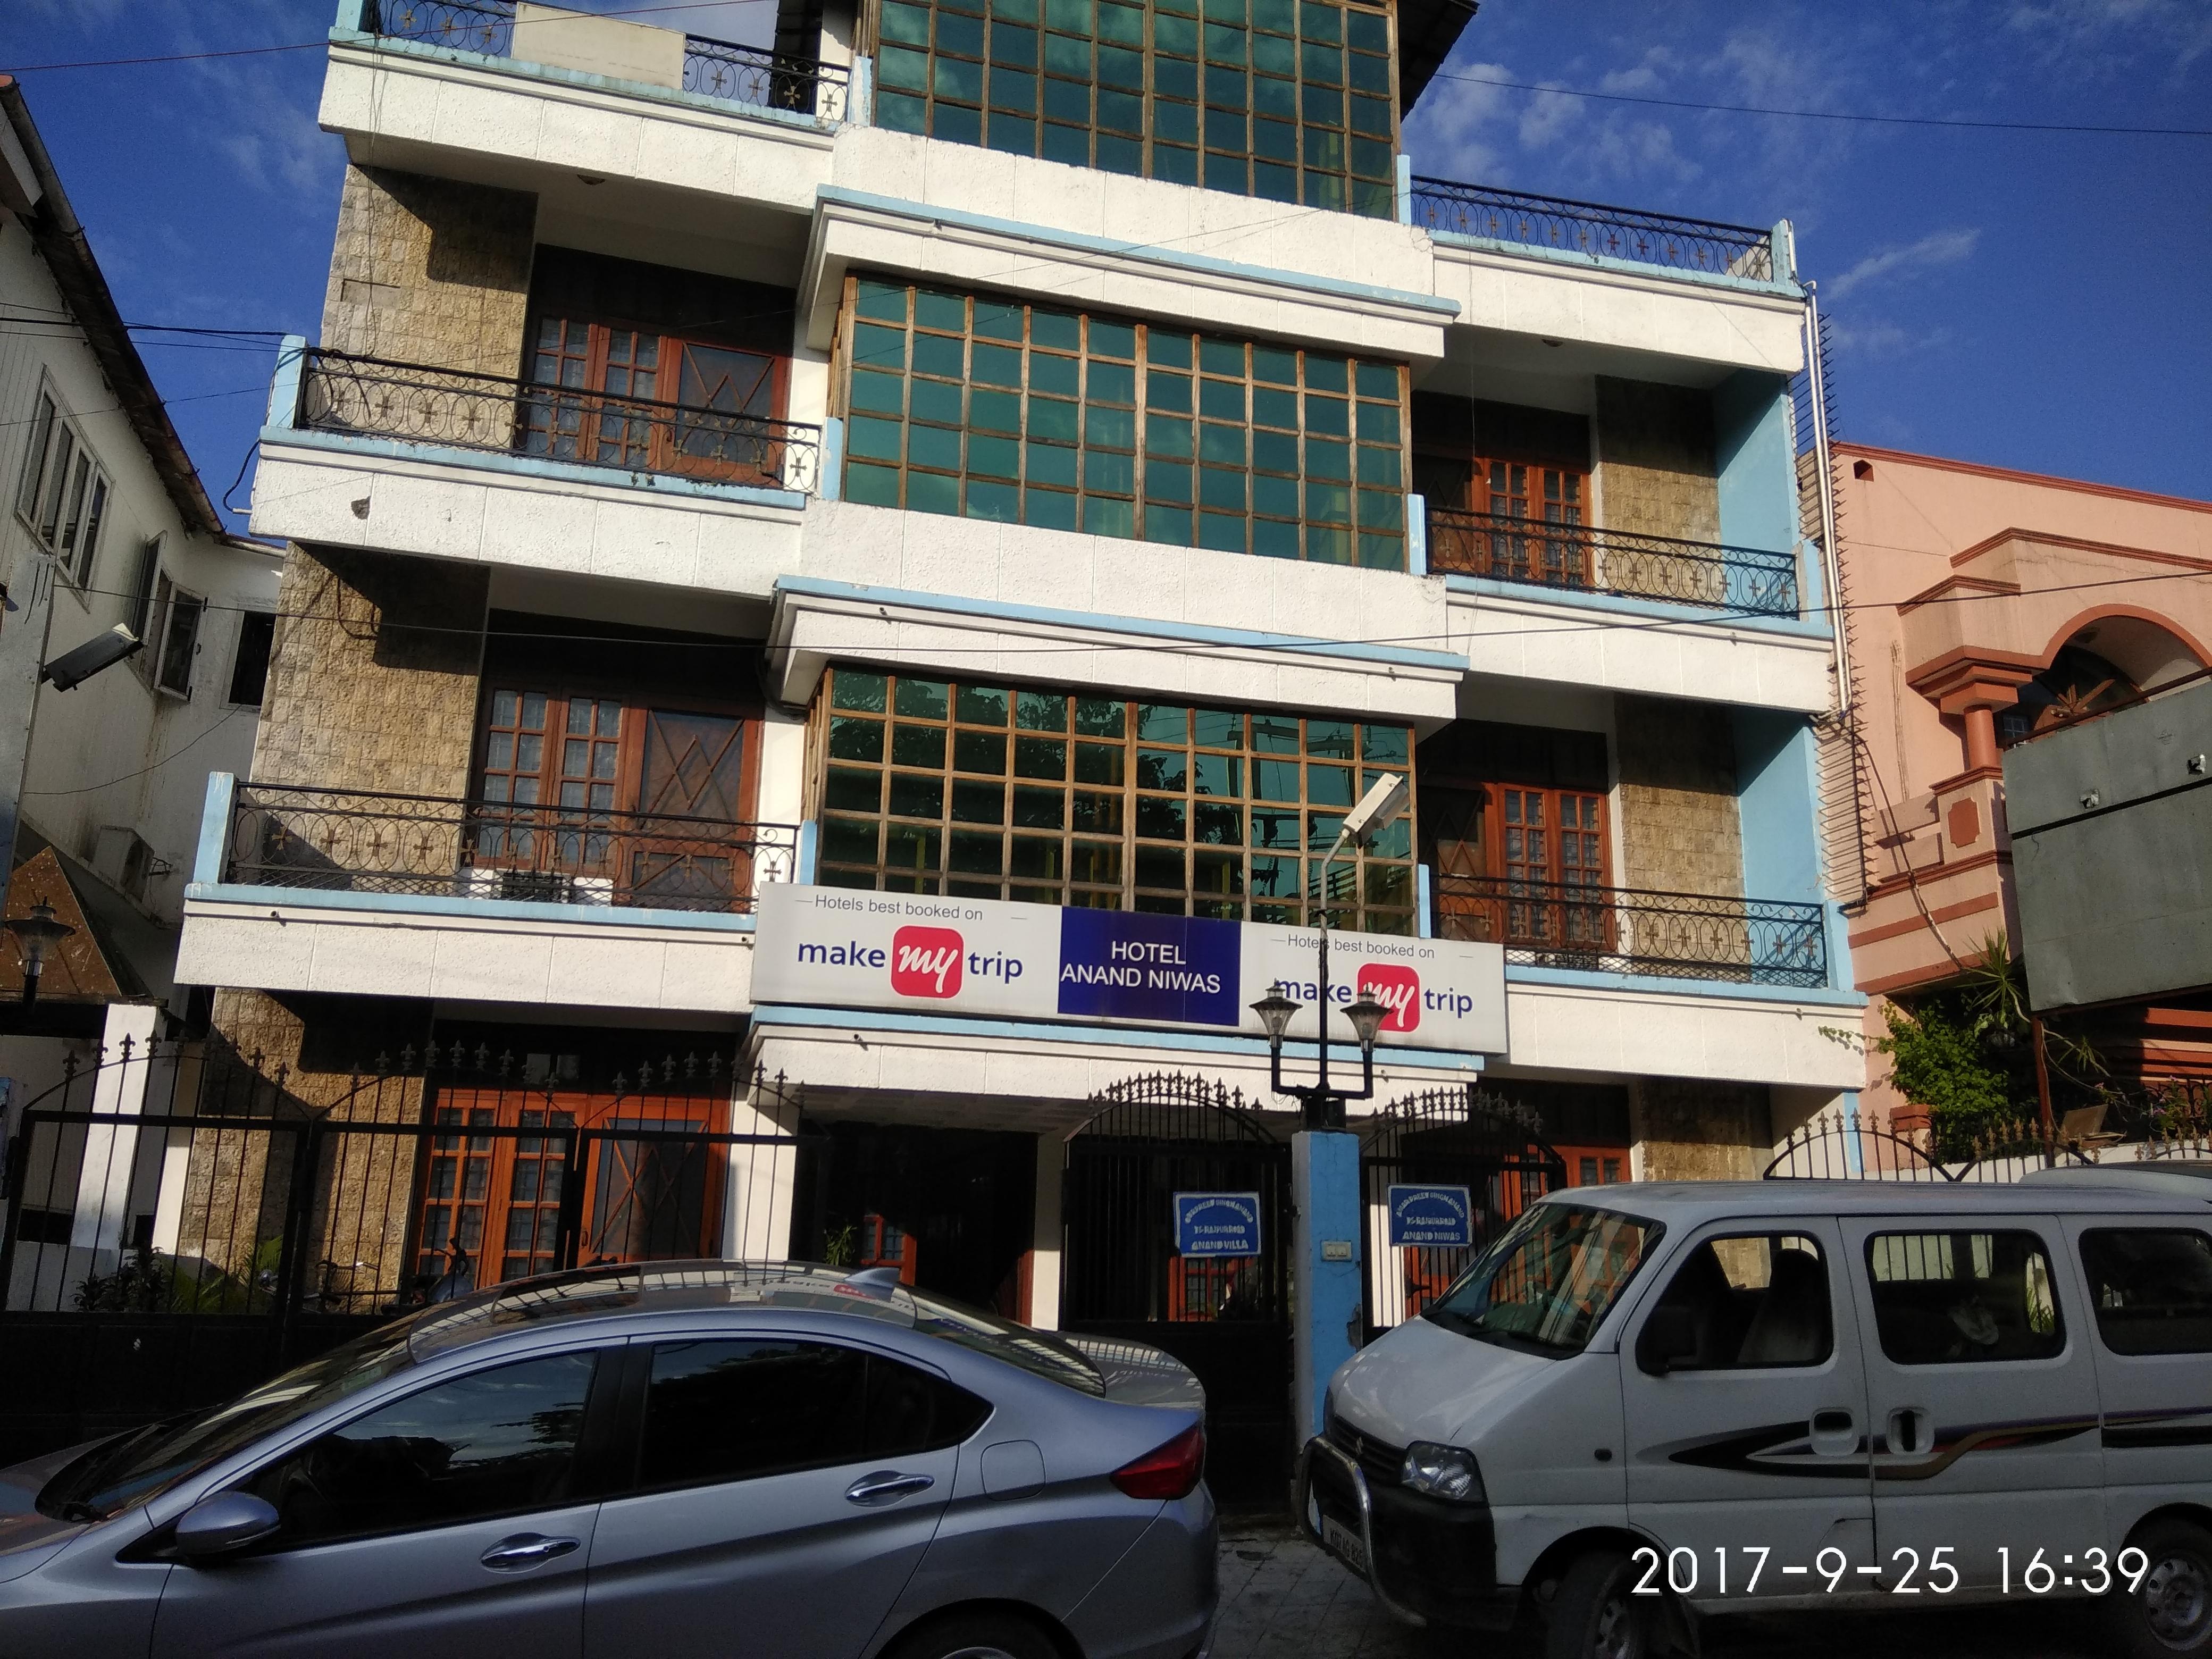 Hotel Anand Niwas in Dehradun